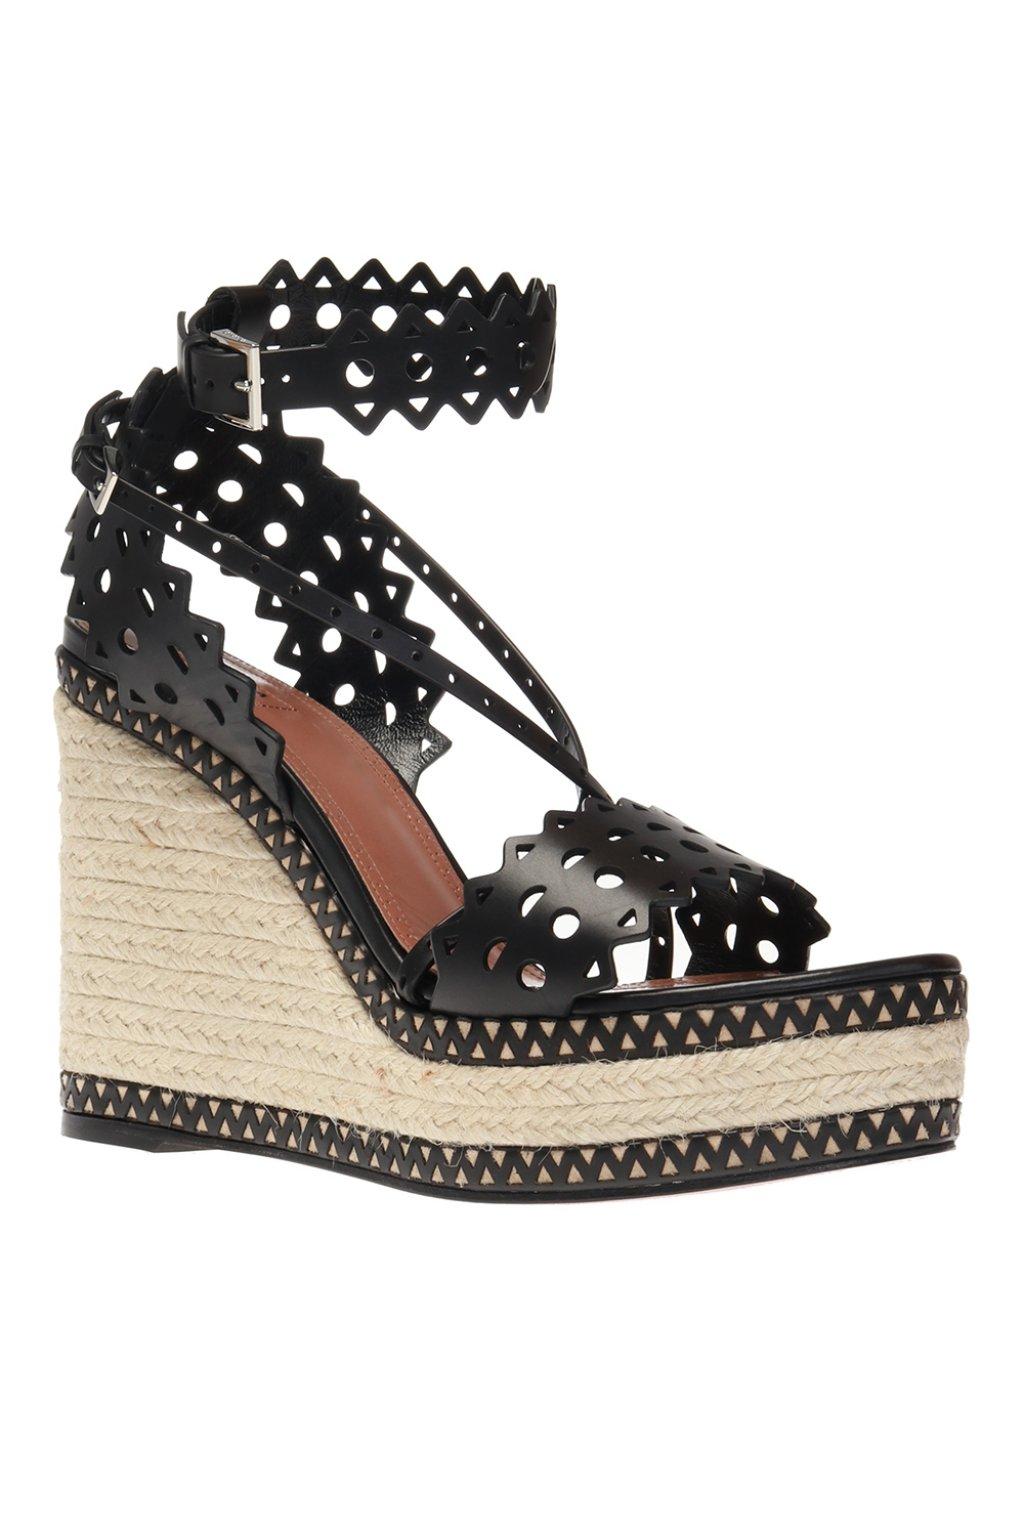 Alaia Wedge sandals